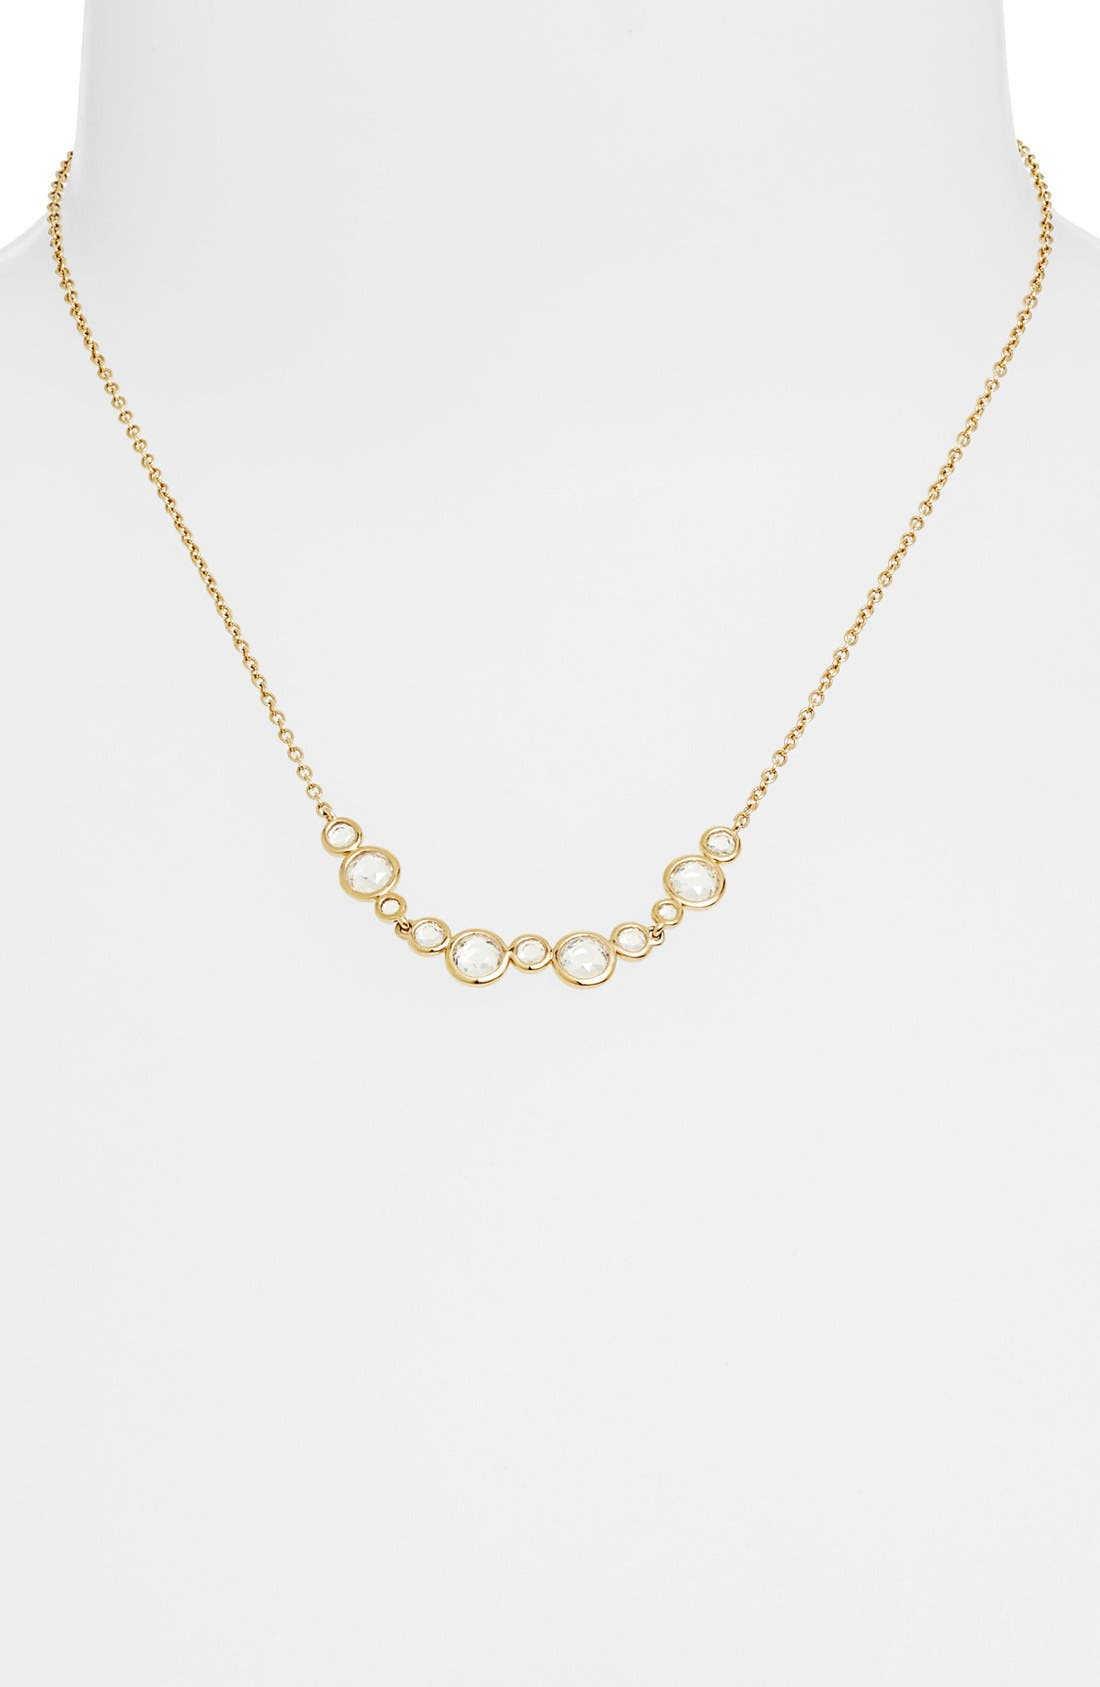 Main Image - Nadri 'Dew Drop' Frontal Necklace